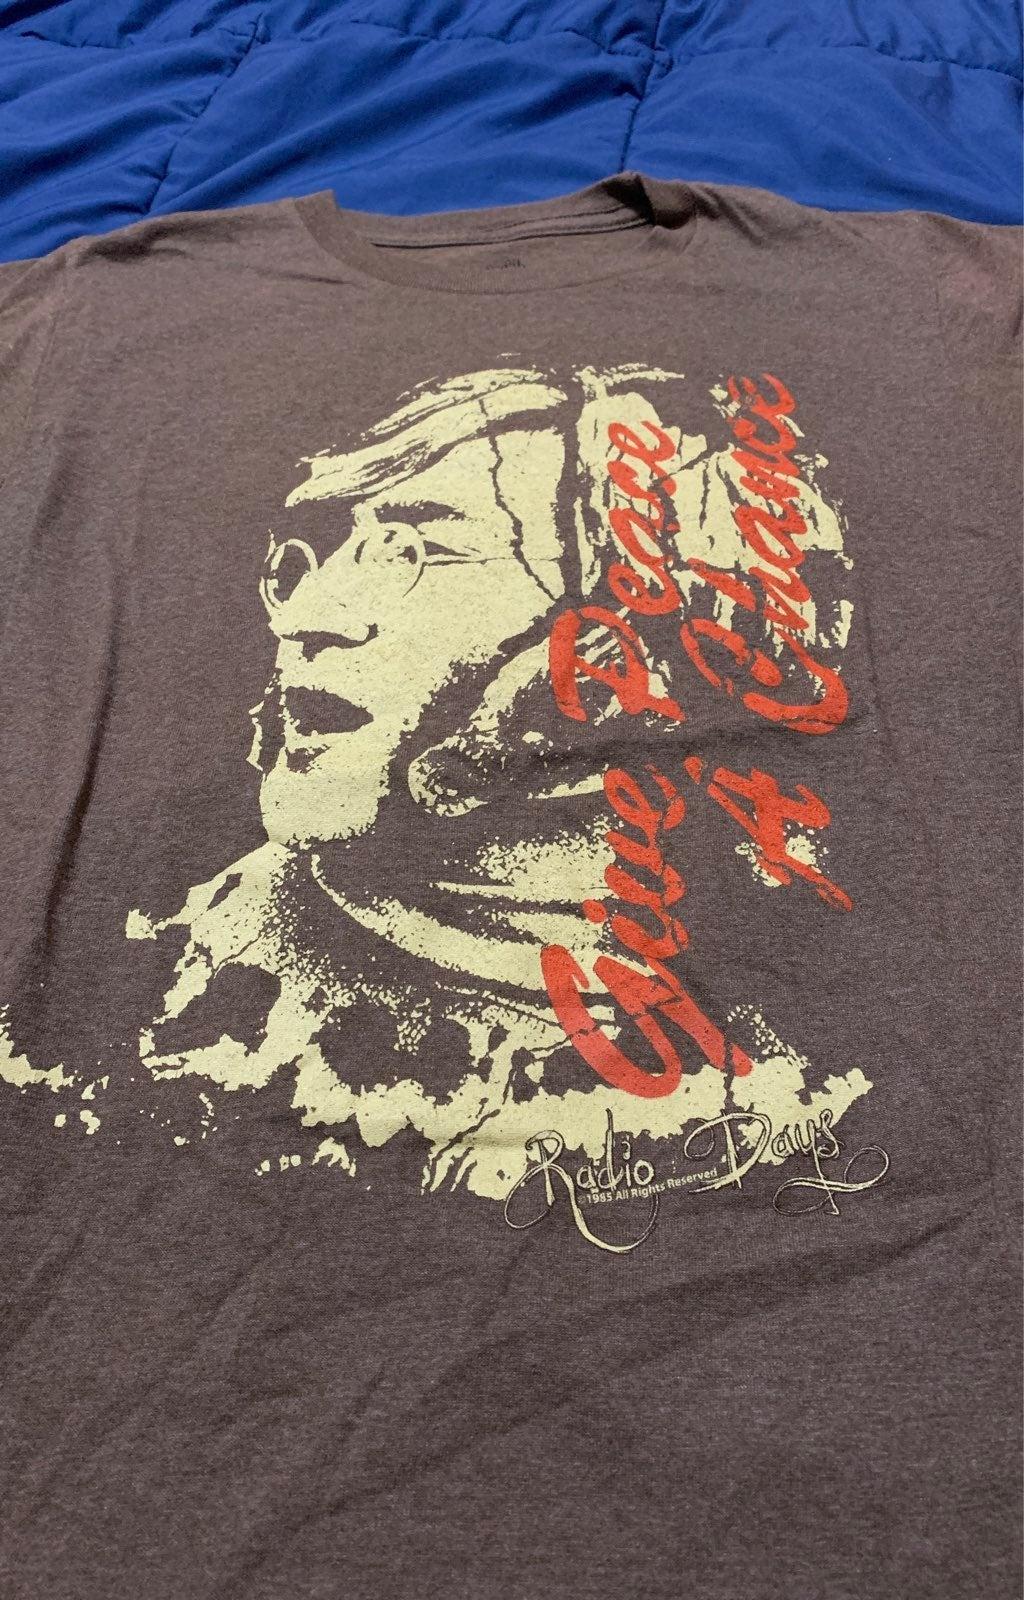 Vintage john lennon shirt sz small